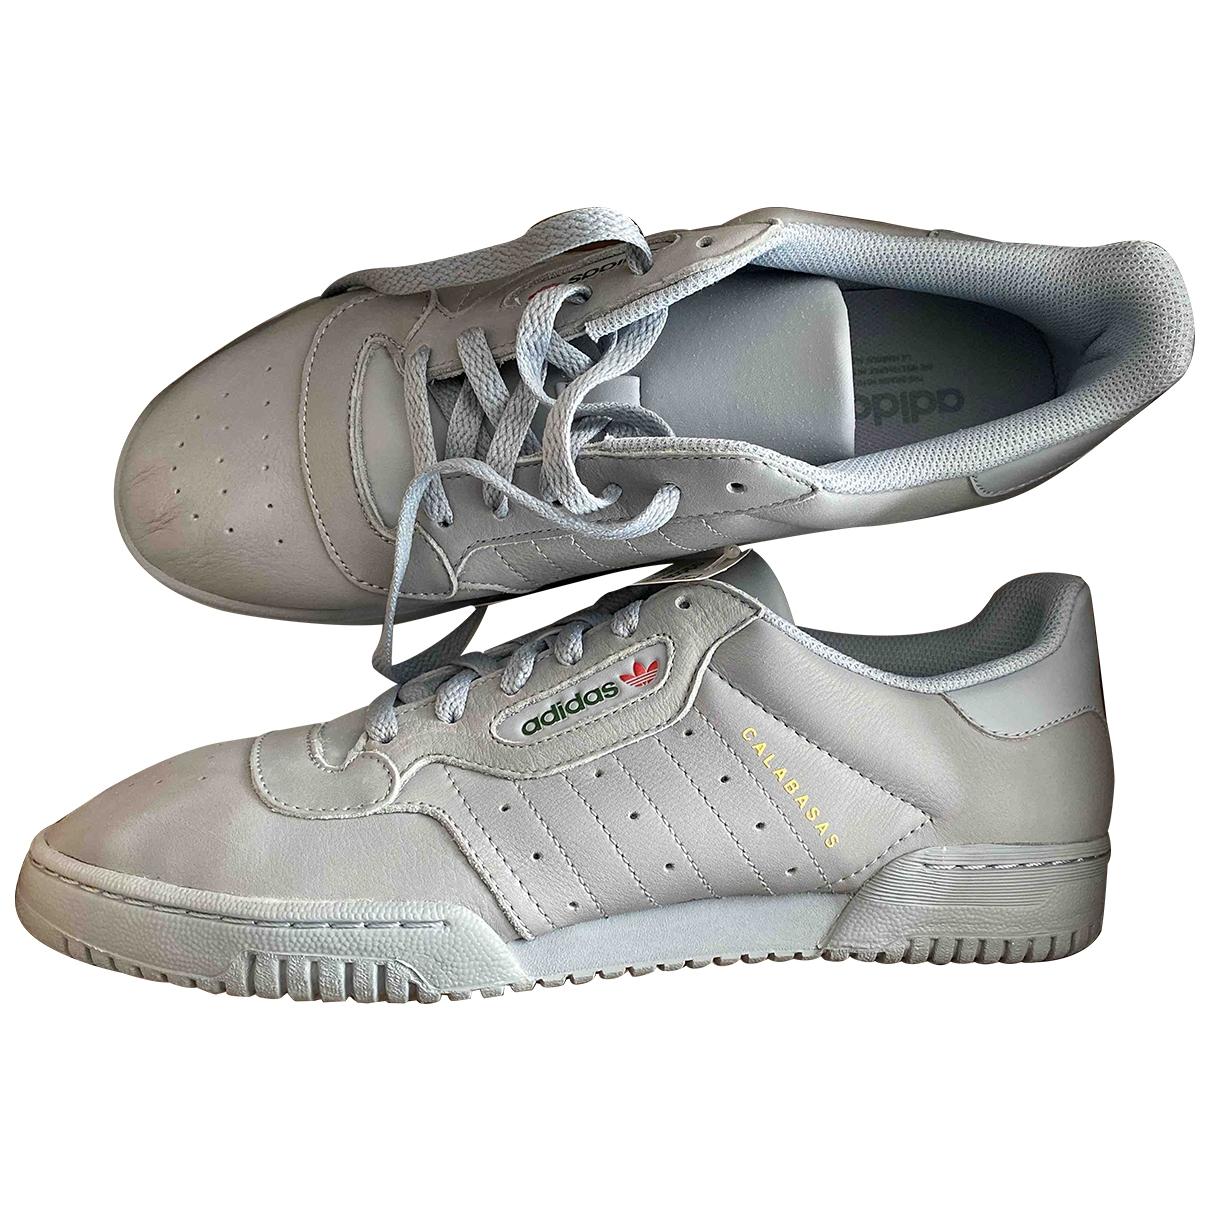 Yeezy X Adidas - Baskets POWERPHASE pour homme en cuir - gris